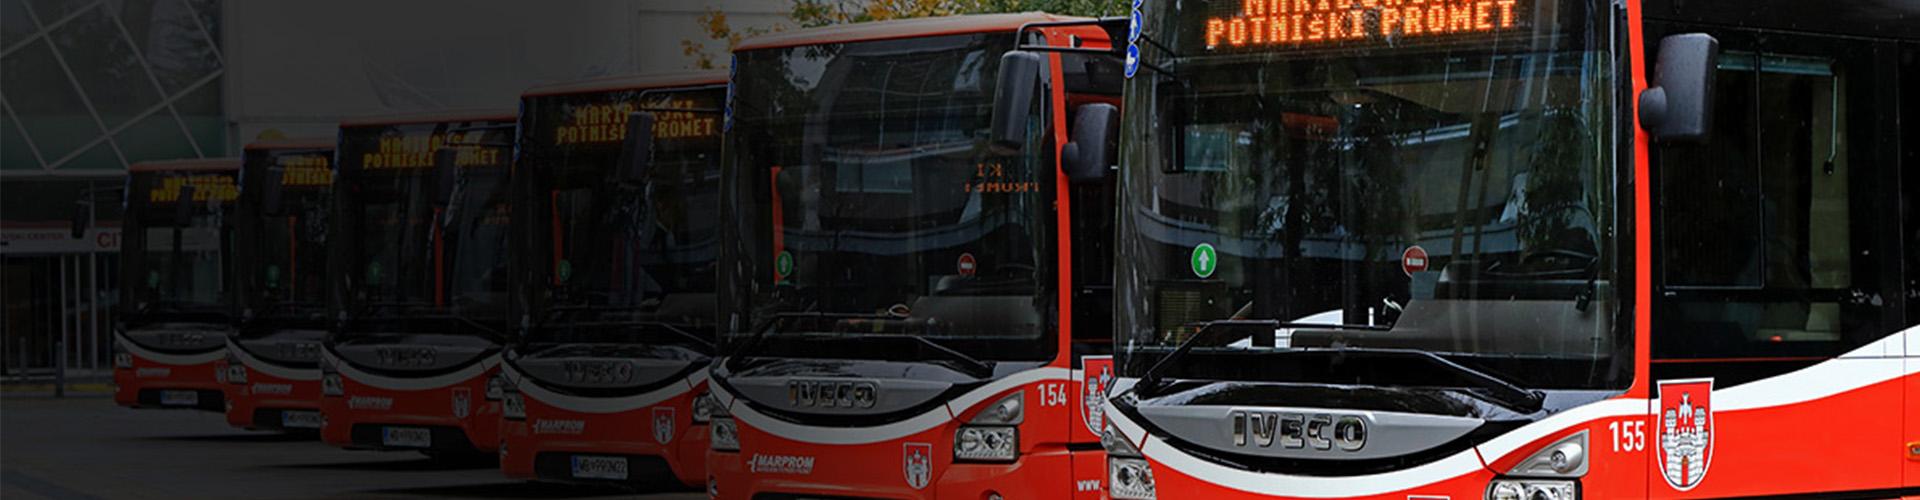 02 avtobusi